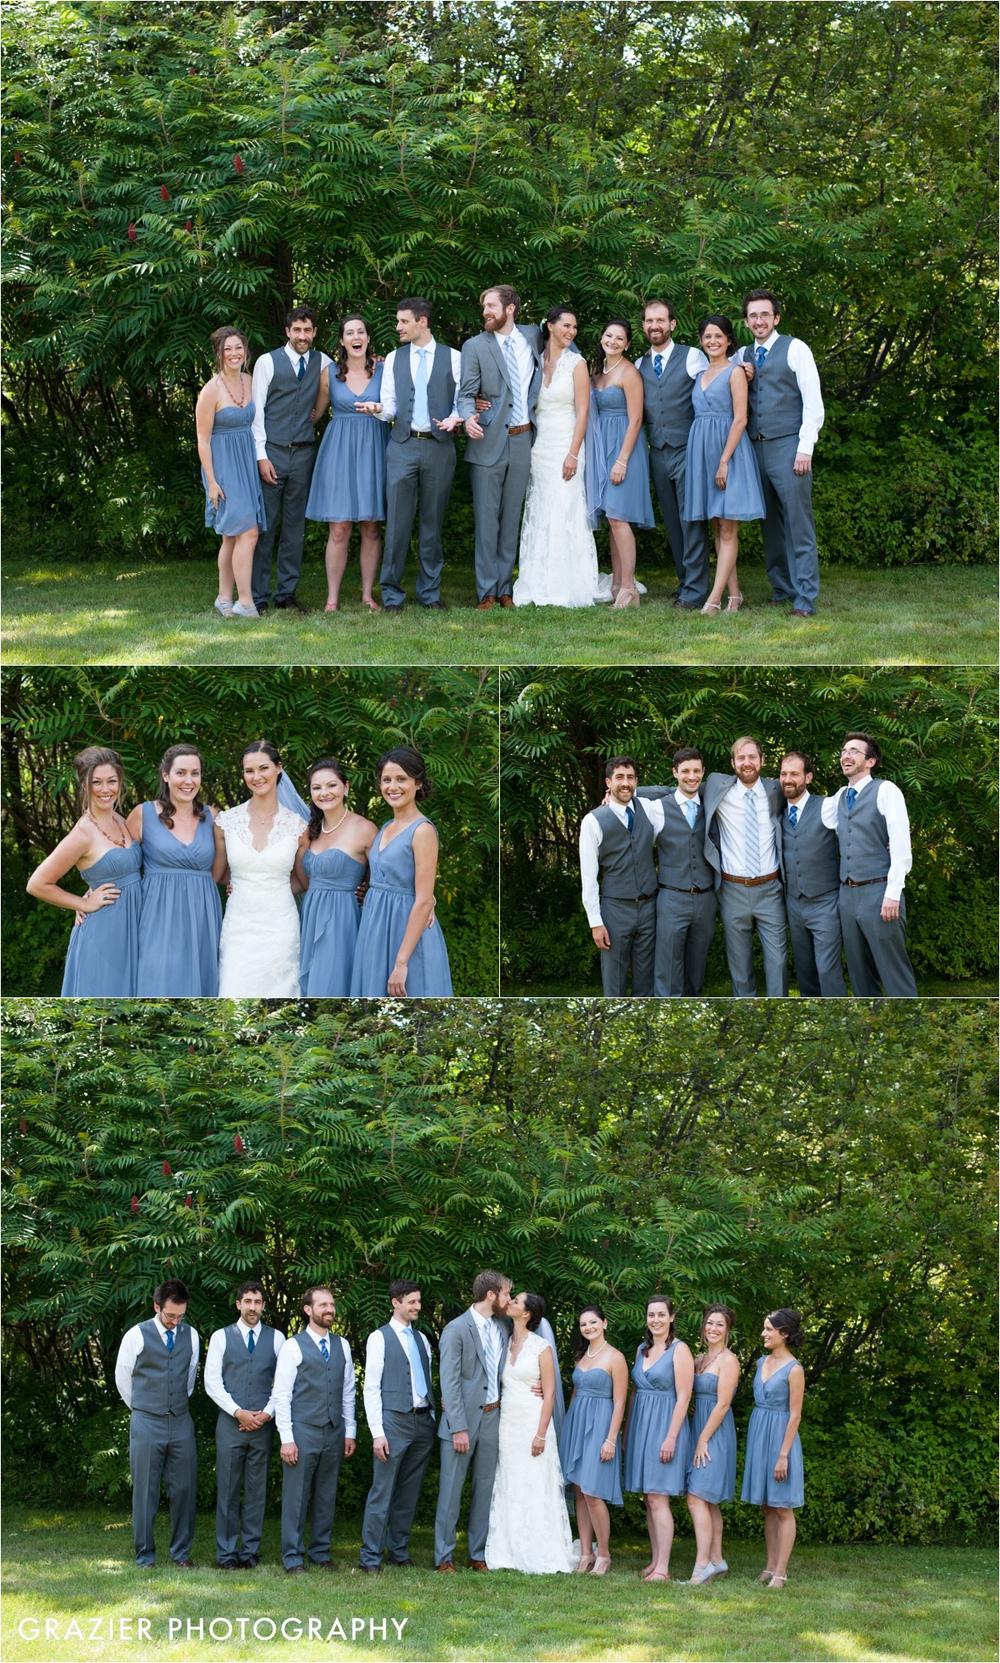 Whitneys-Inn-Jackson-New-Hampshire-Wedding-Grazier-Photography-WEB_0023.jpg